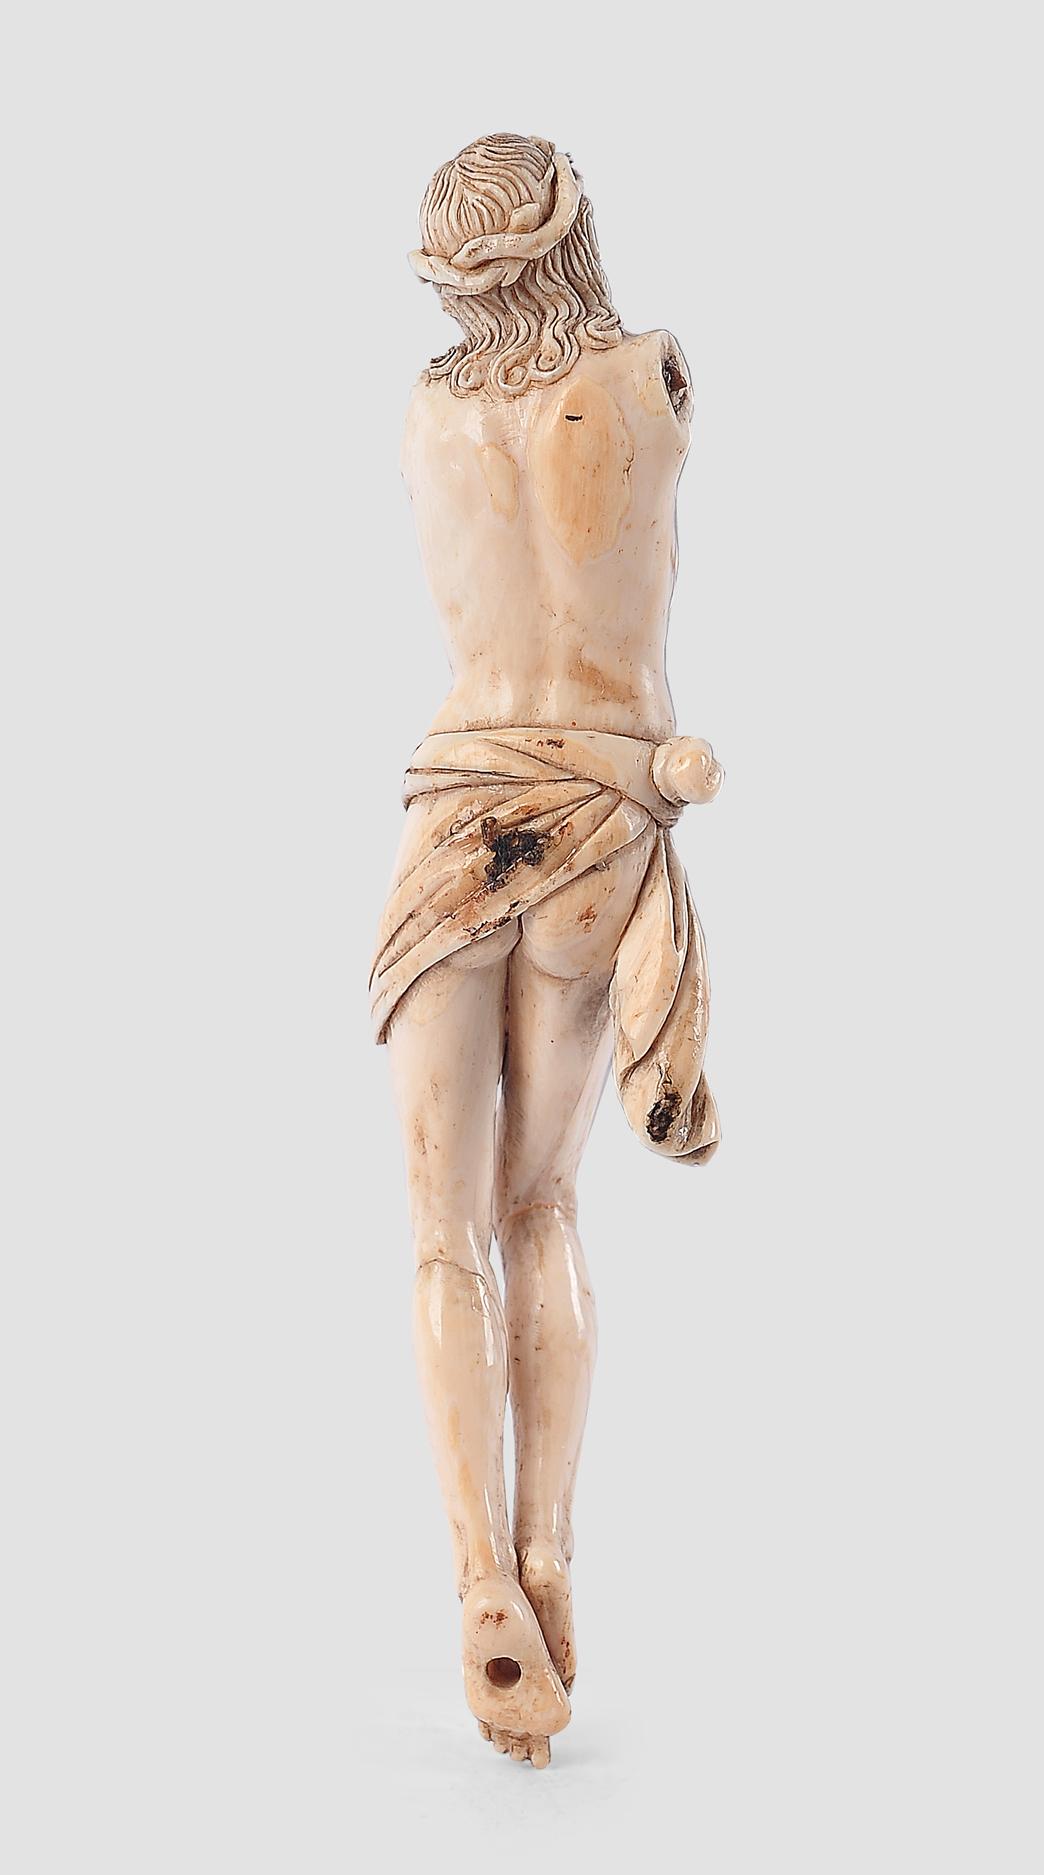 Corpus Christi, 18. Jahrhundert, Elfenbein - Image 2 of 2